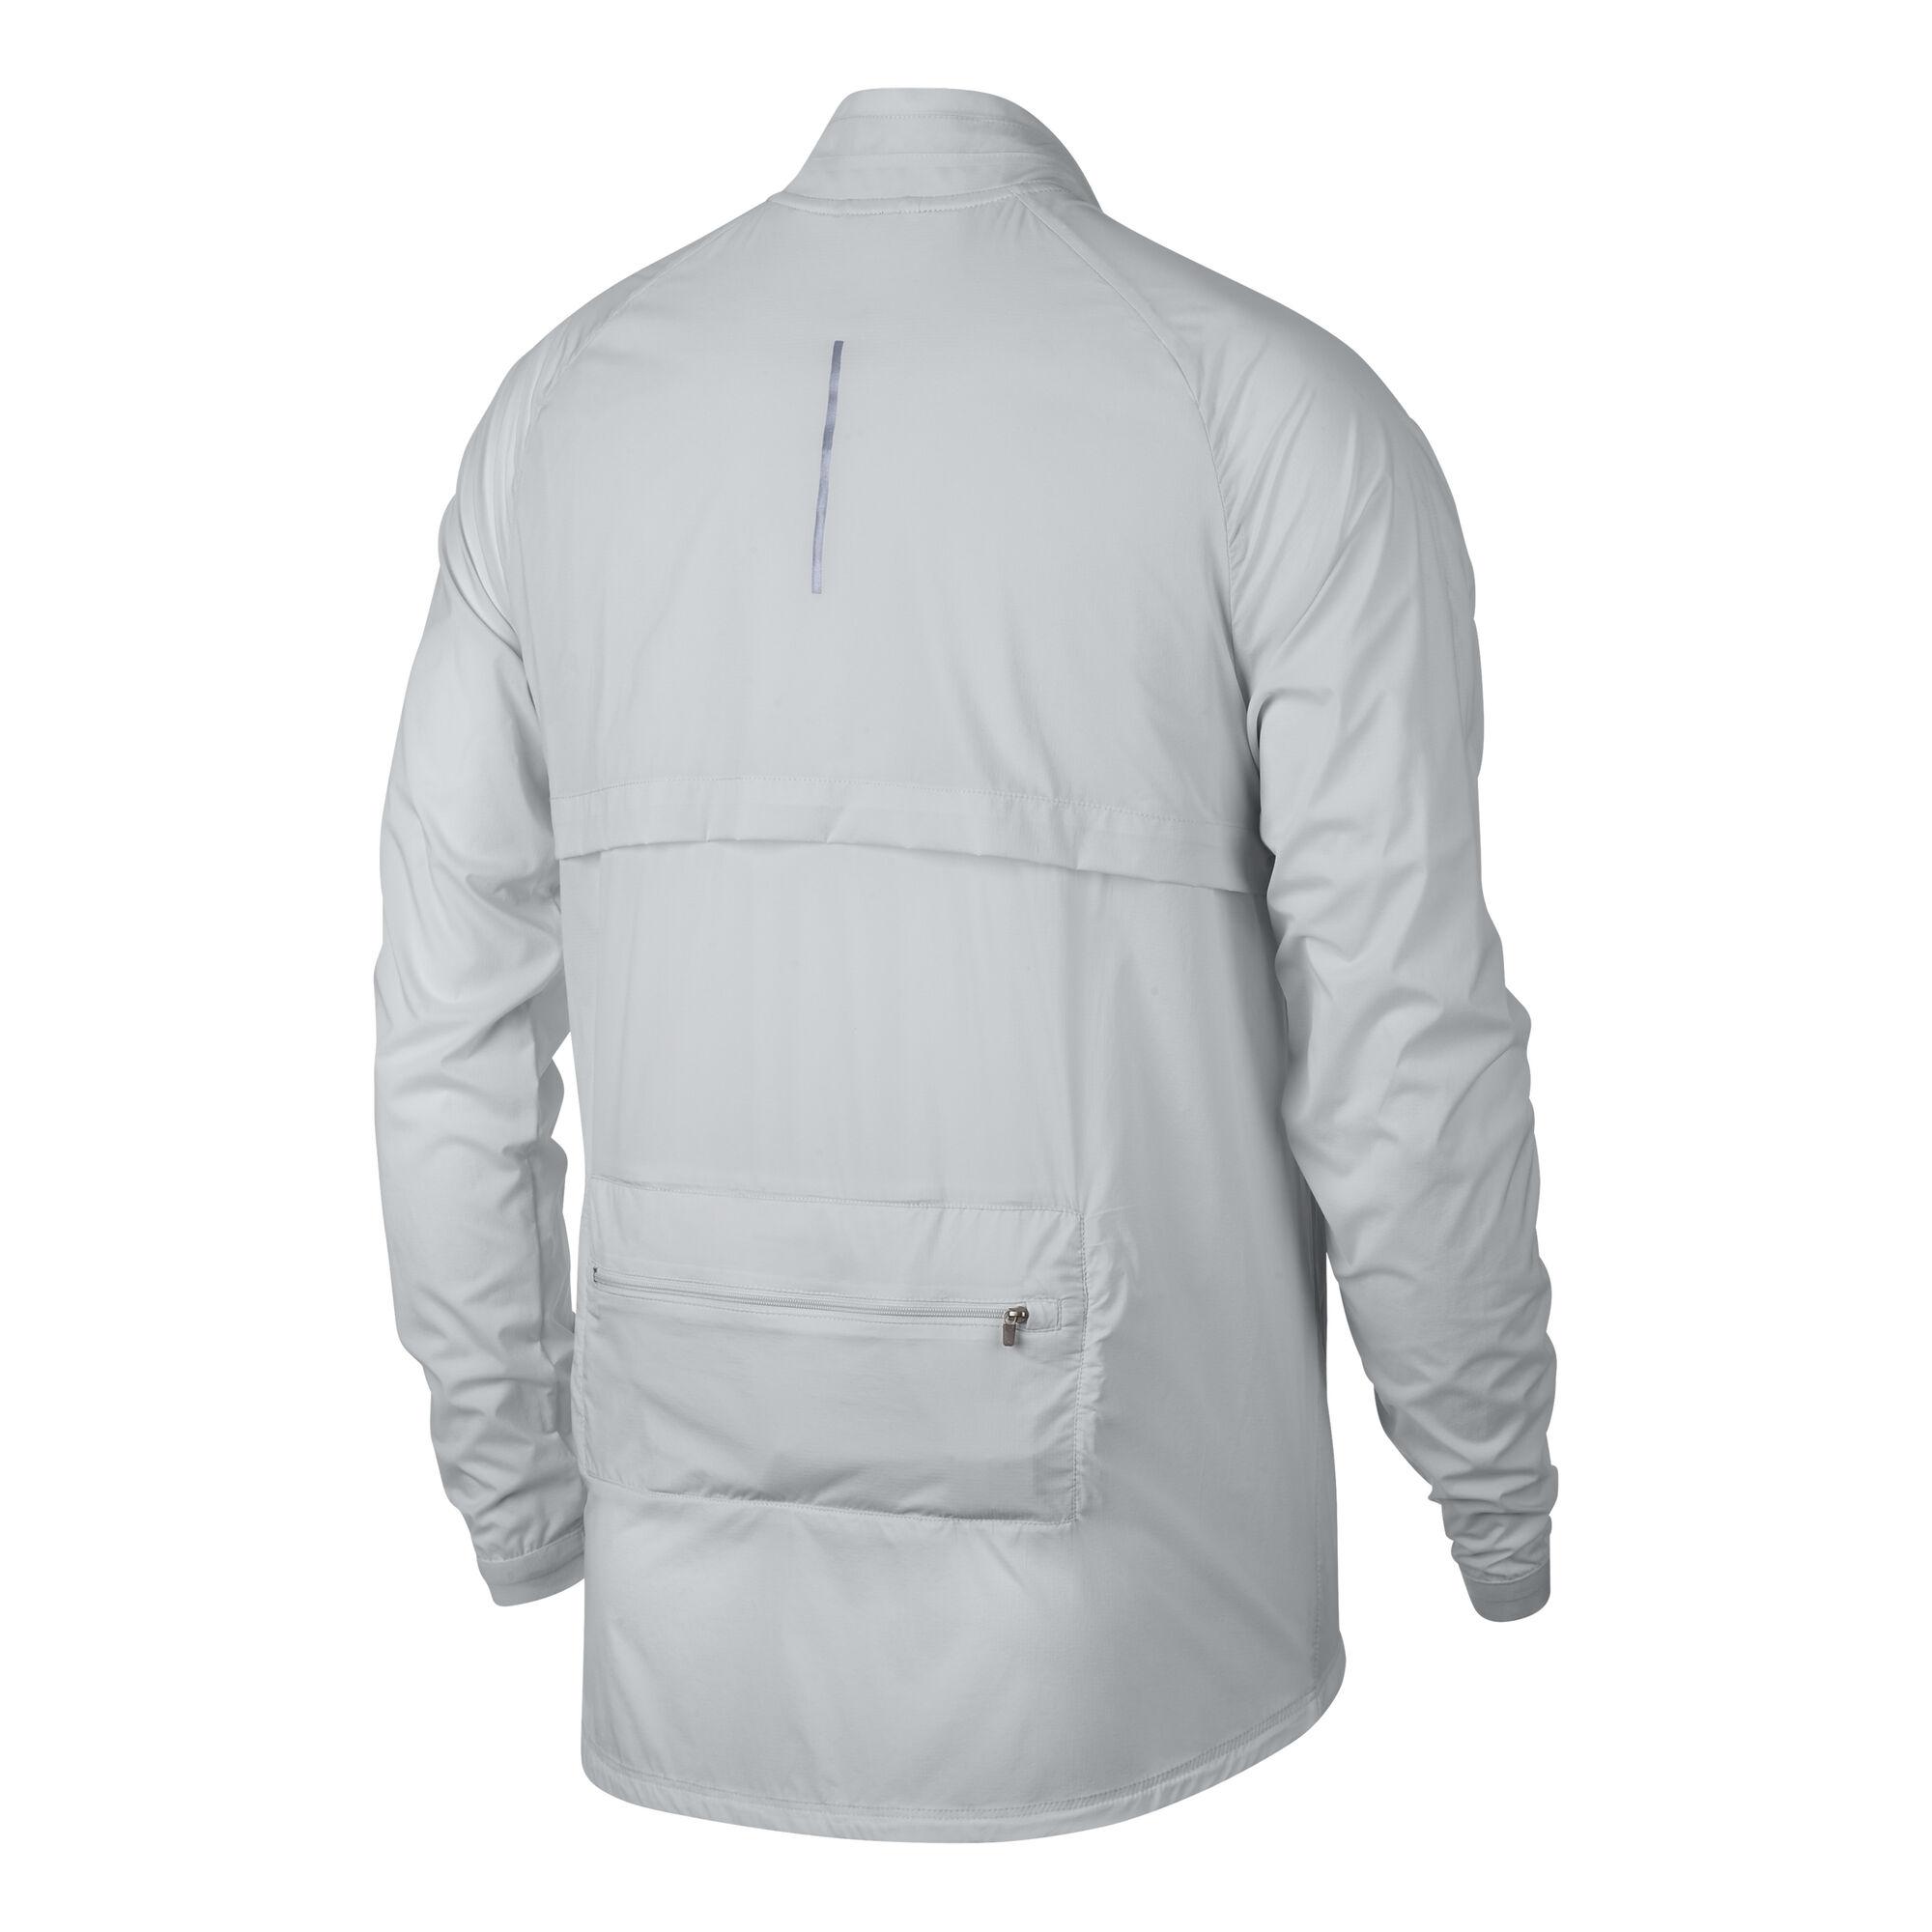 a855f42a62 buy Nike Shield Convertible Running Jacket Men - Lightgrey